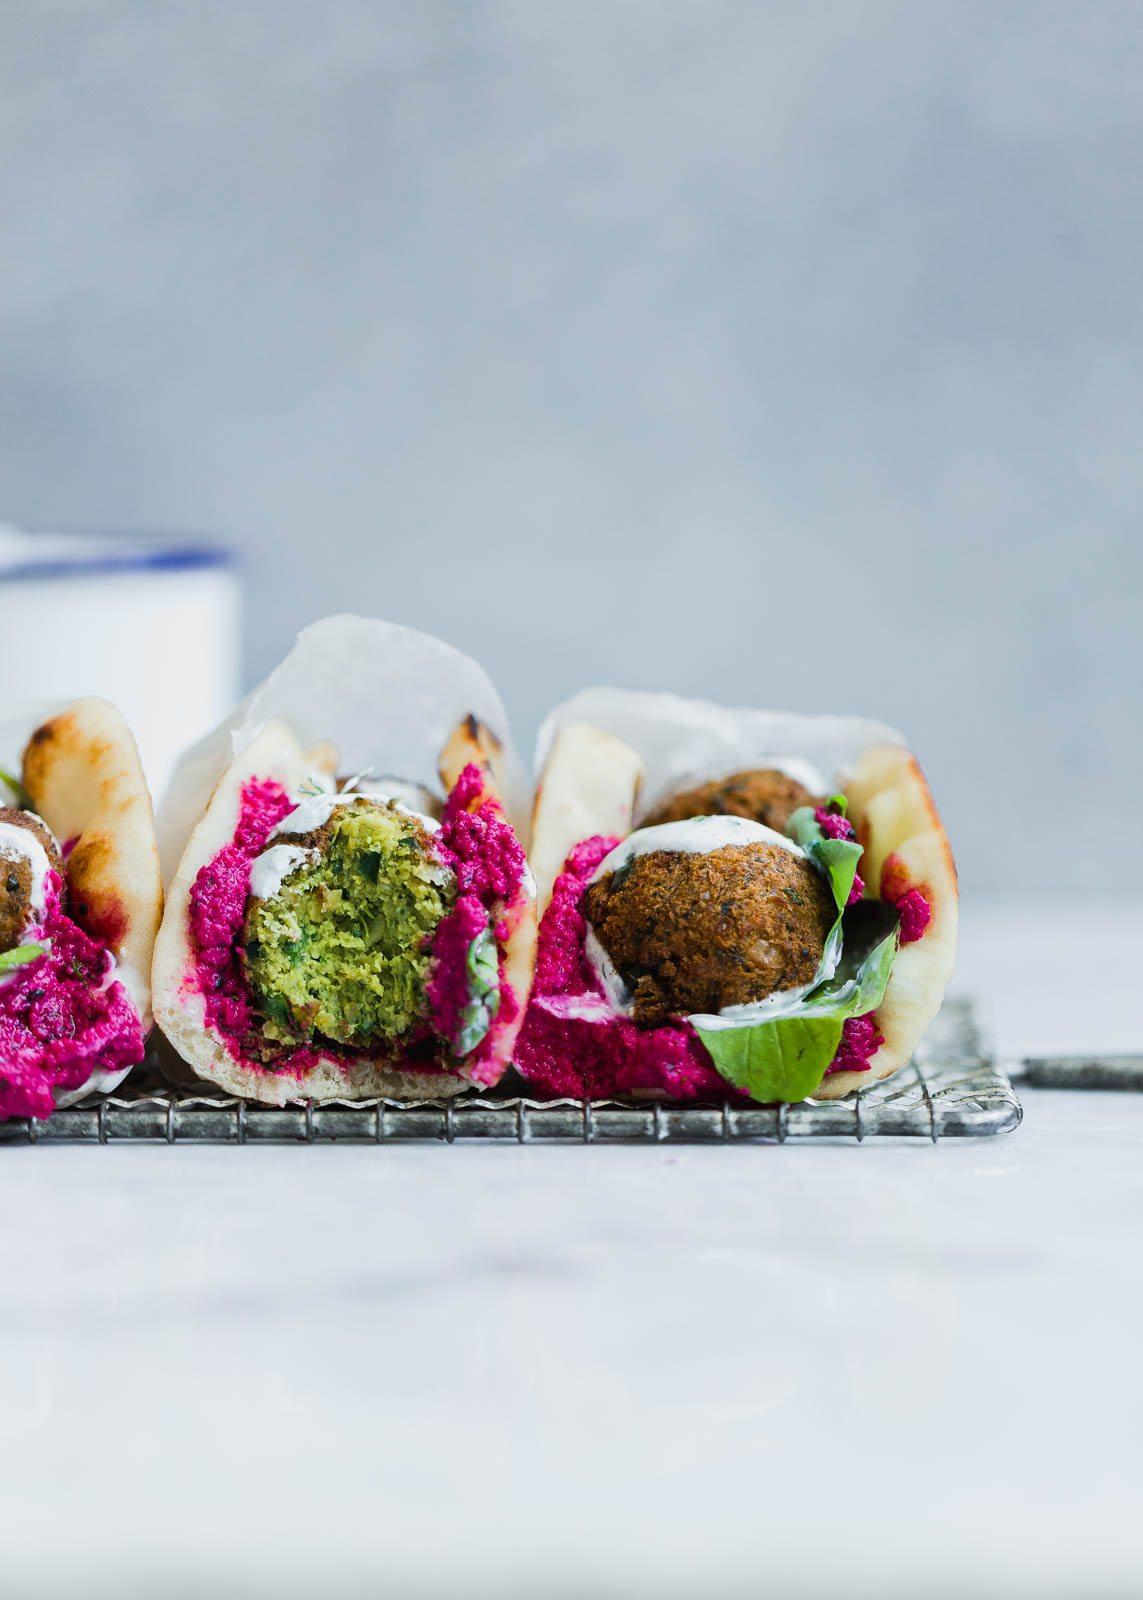 Green-Falafel-Sandwich-2